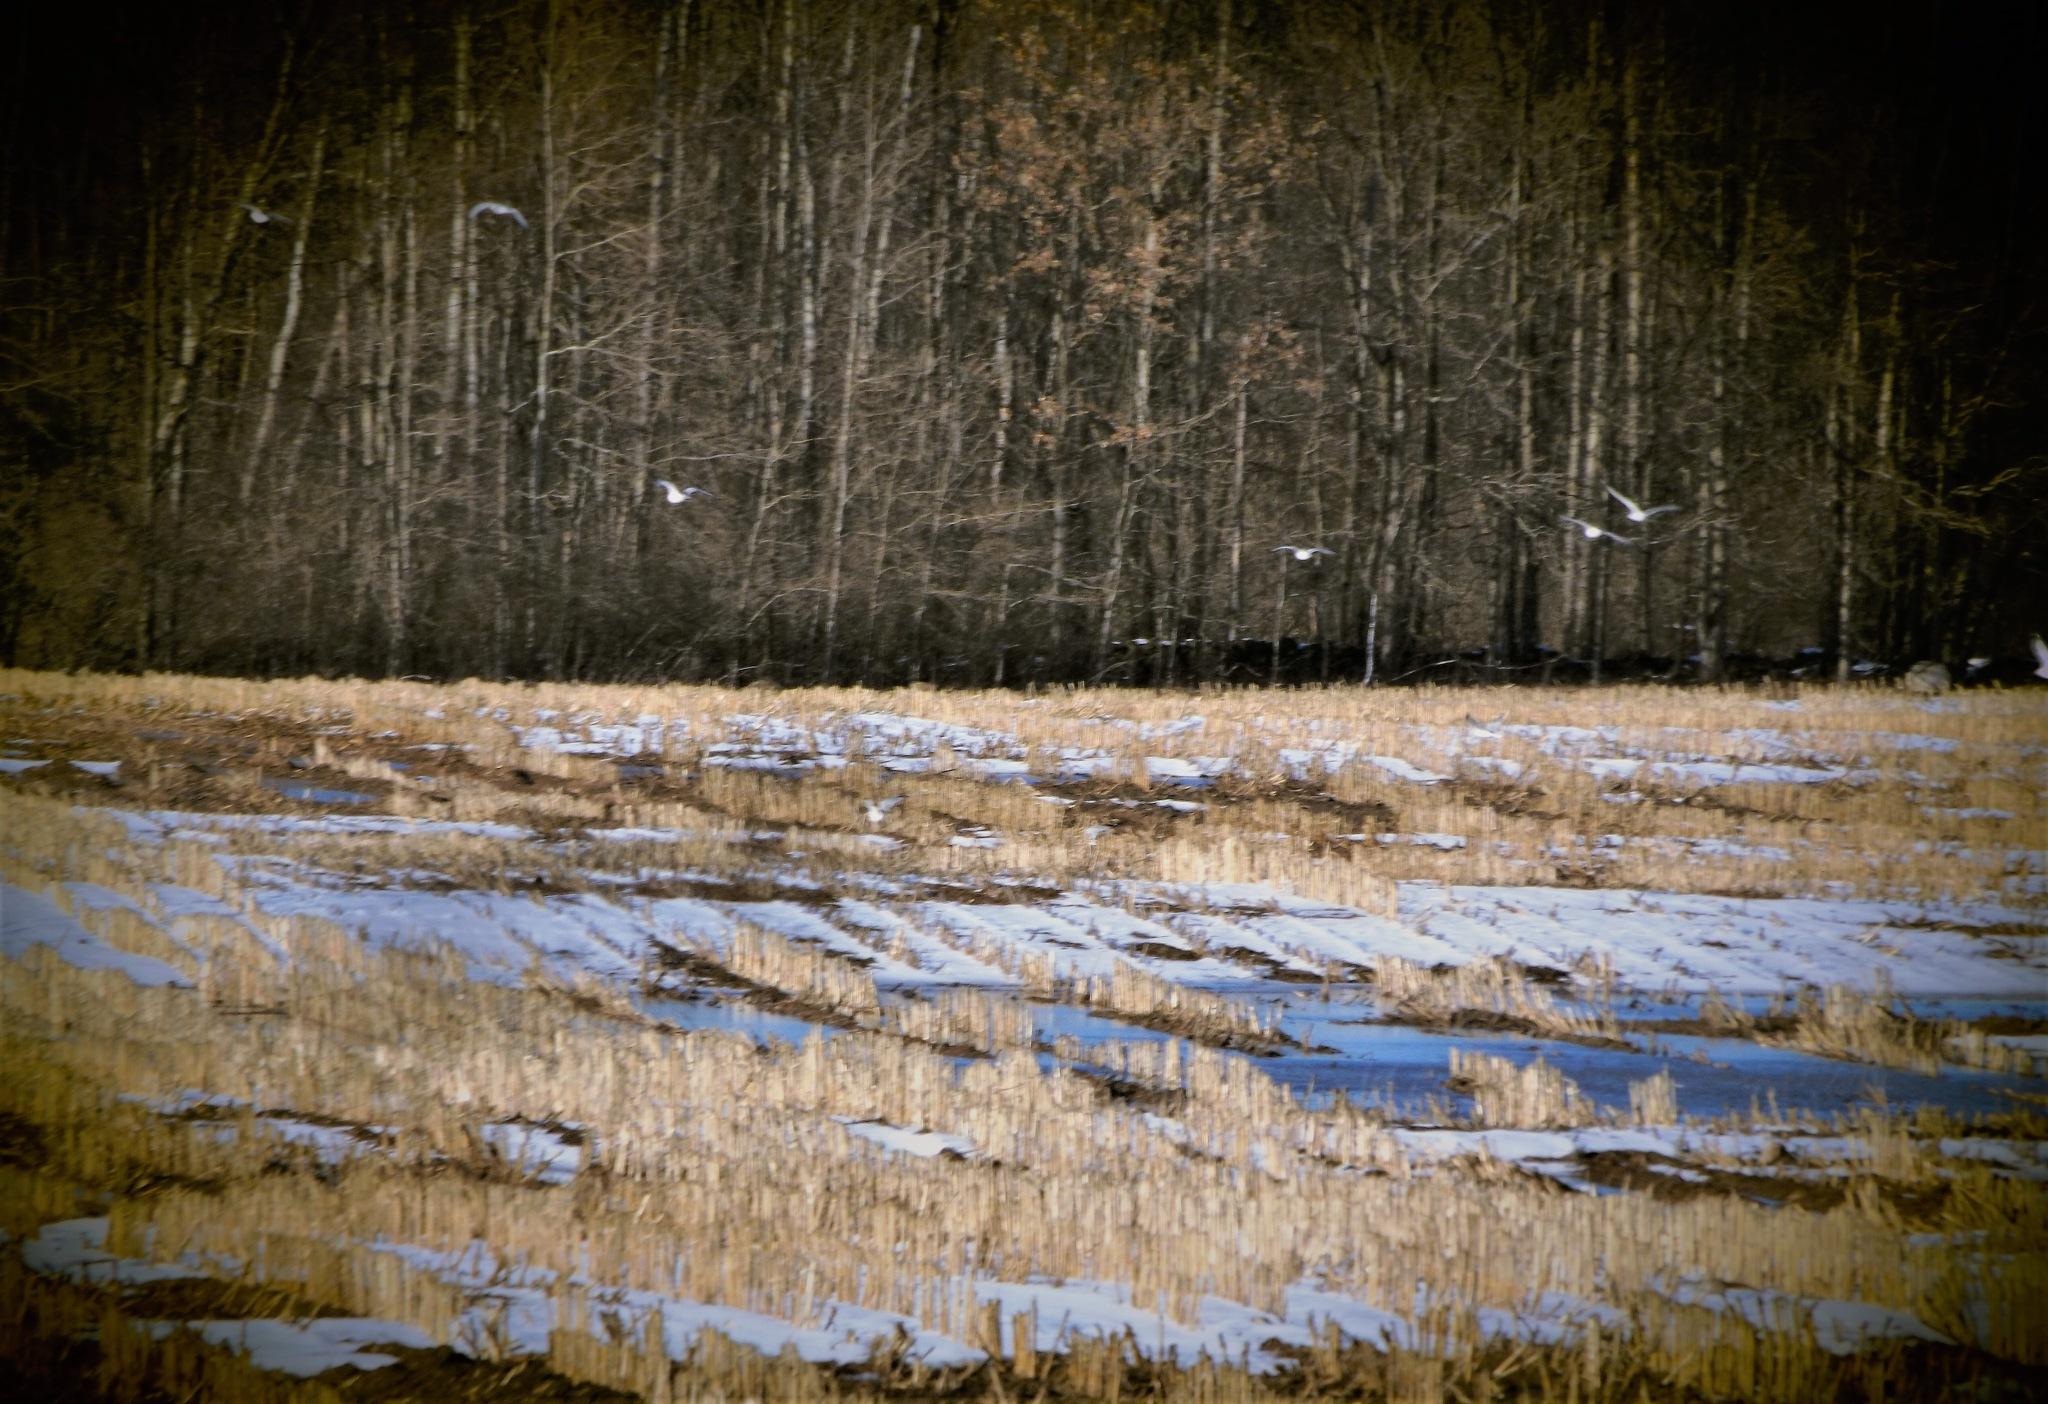 SEAGULLS INLAND by Dawn Hoffmeister